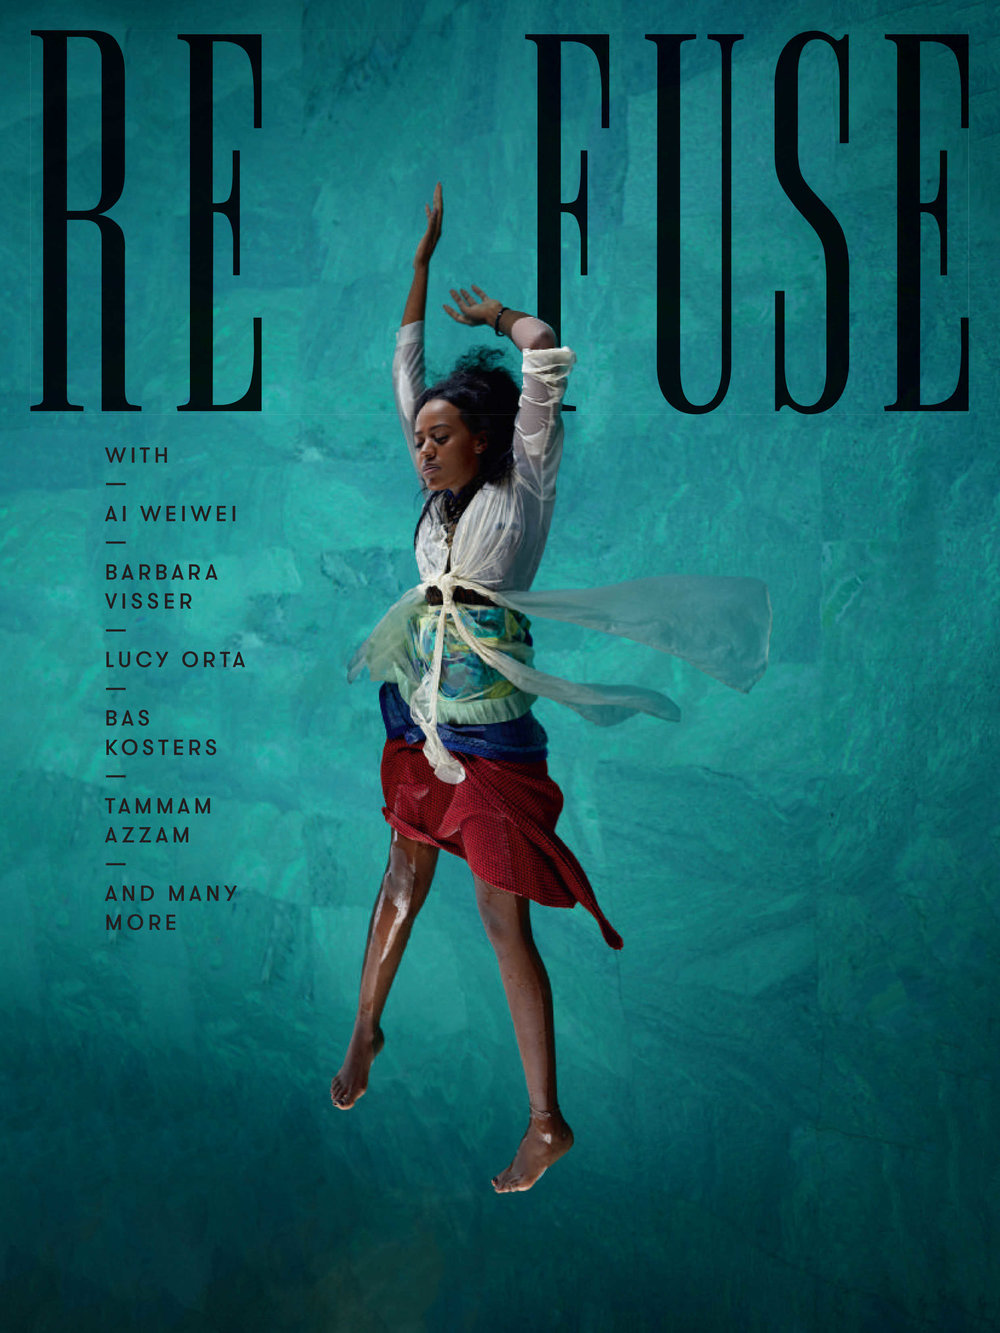 re_fuse_magazine_1web.jpg()(3290E2DE5A6A8E4EA31C1C459B5830E7).jpg